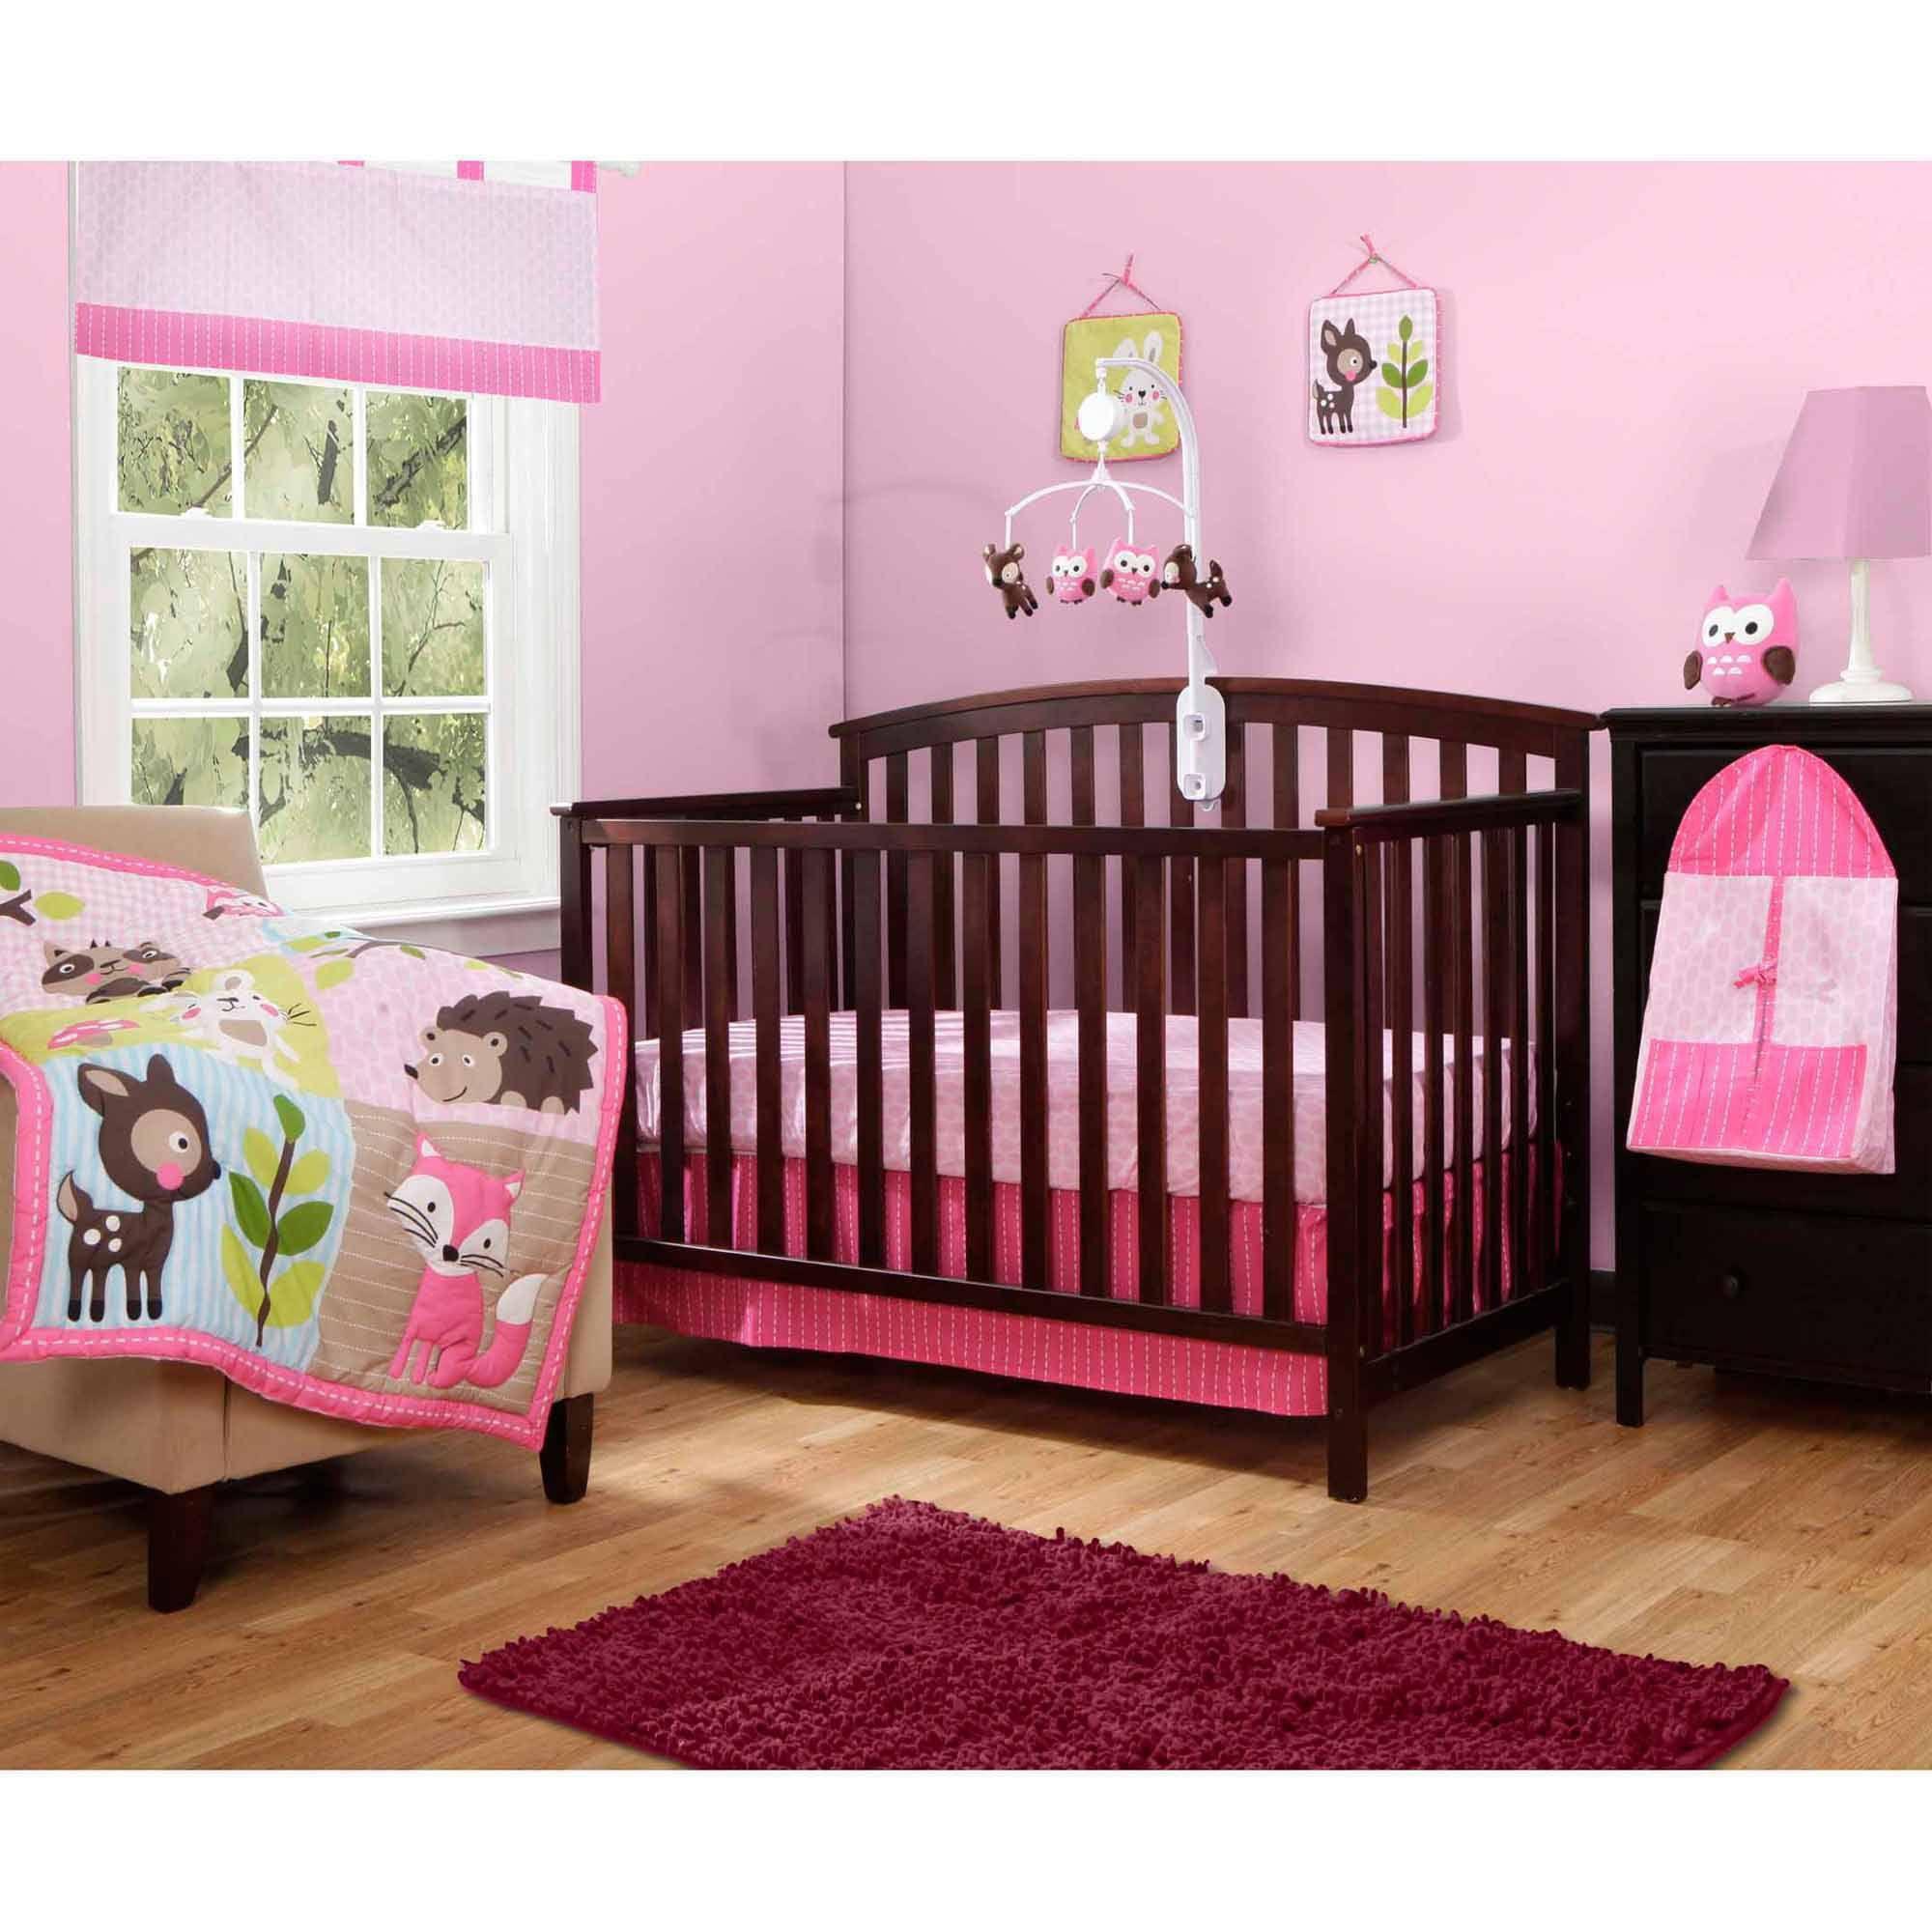 Baby Boom Woodland Girl 10 Piece Crib Bedding Set Walmart Com